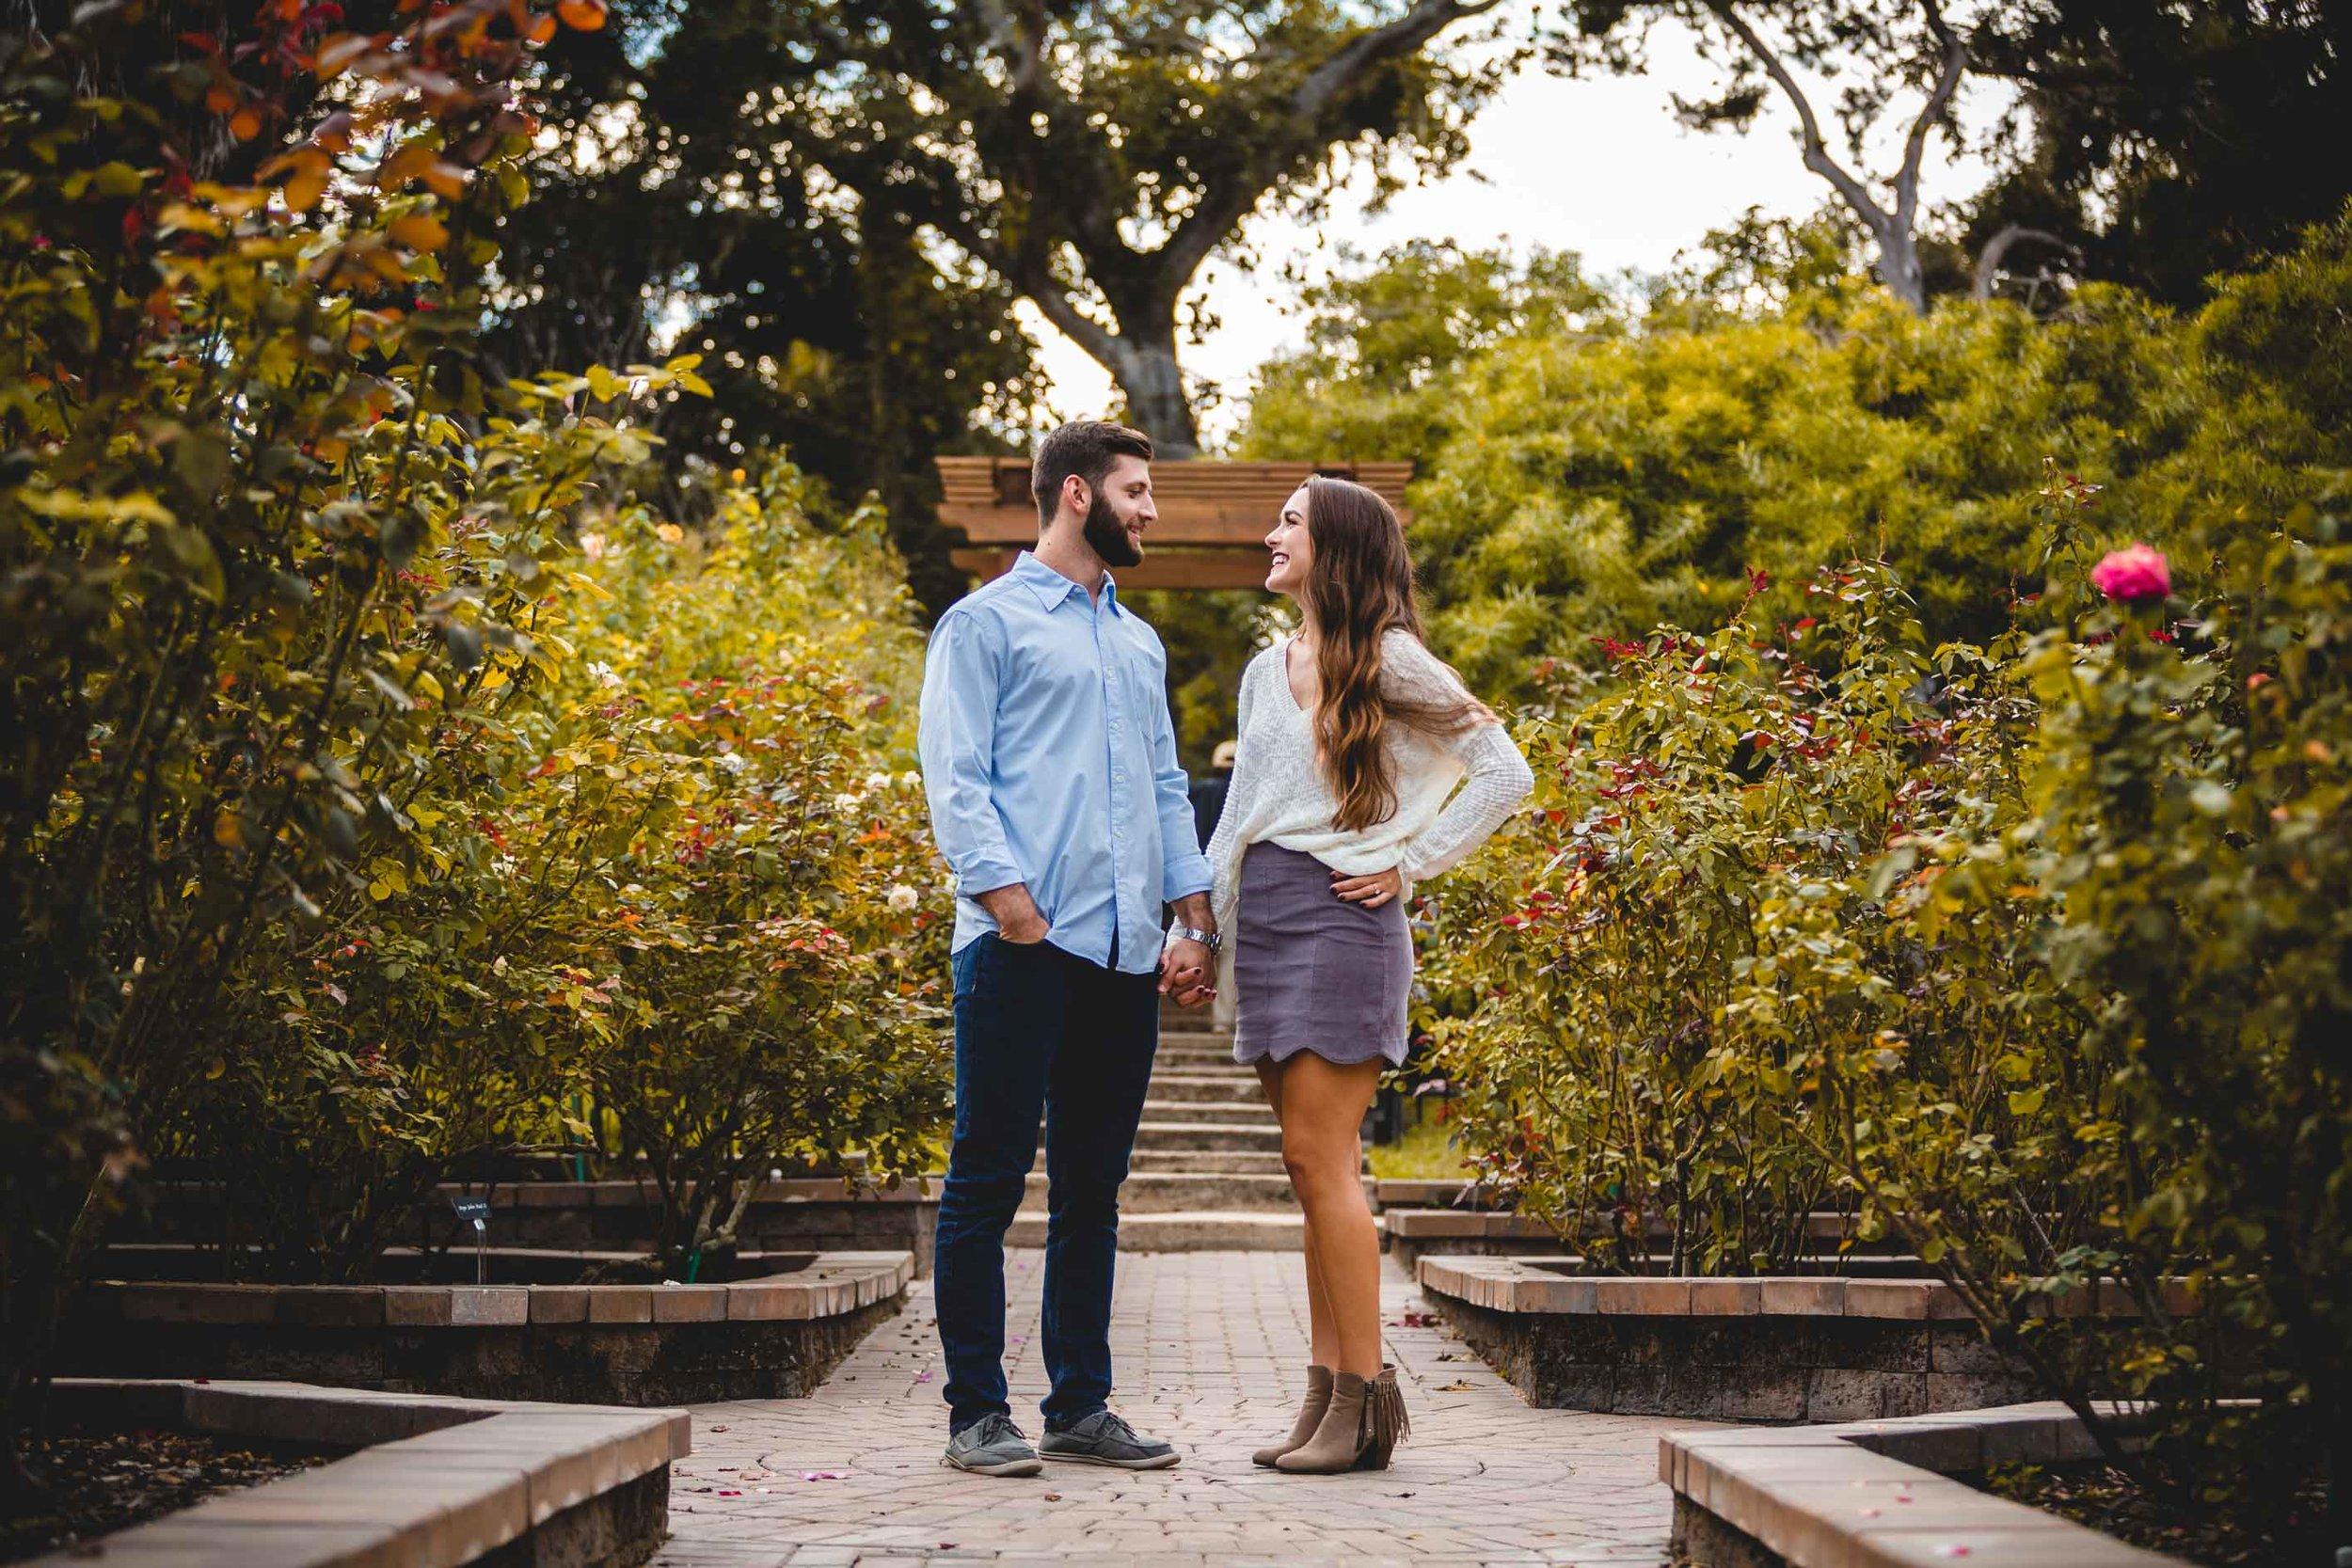 adam-szarmack-jacksonville-wedding-photographer-palm-coast-washing-oaks-garden-state-park-engagement-22.jpg